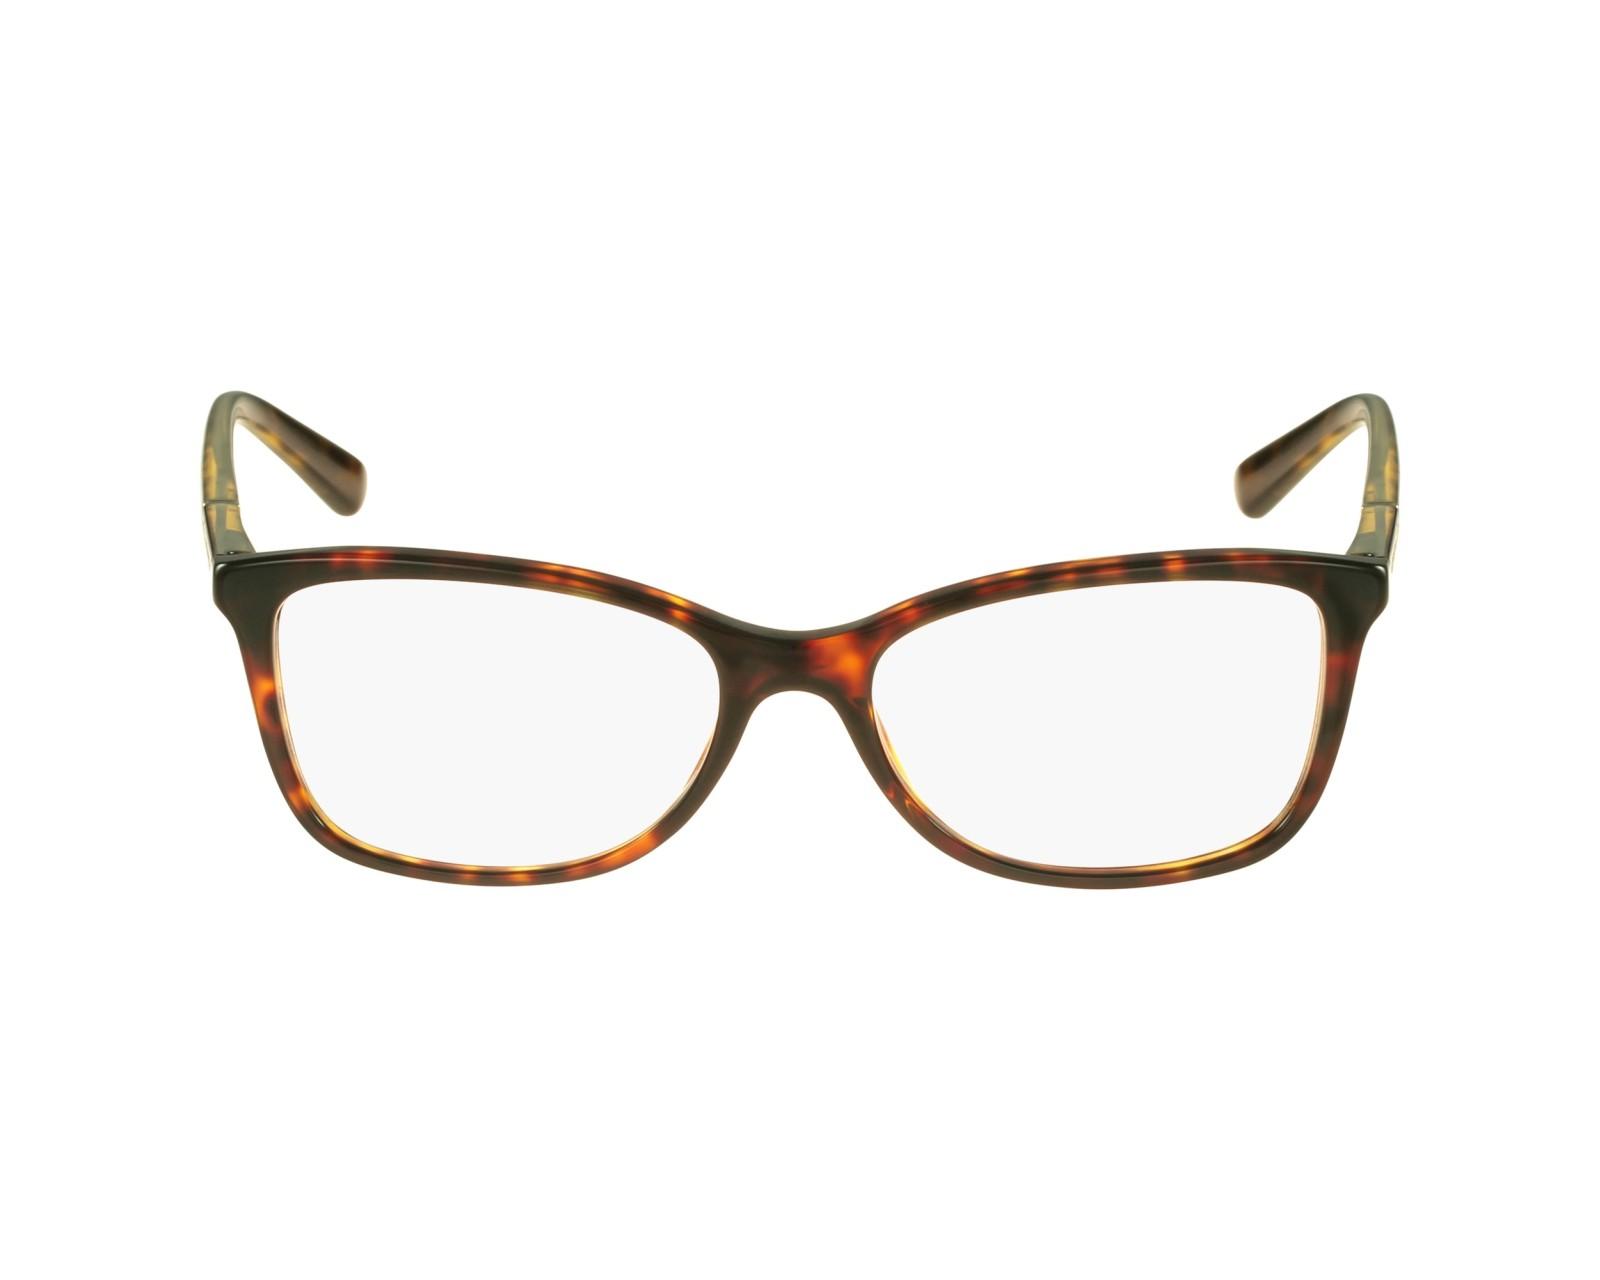 lunettes de vue dolce gabbana dg 3219 502 marron. Black Bedroom Furniture Sets. Home Design Ideas